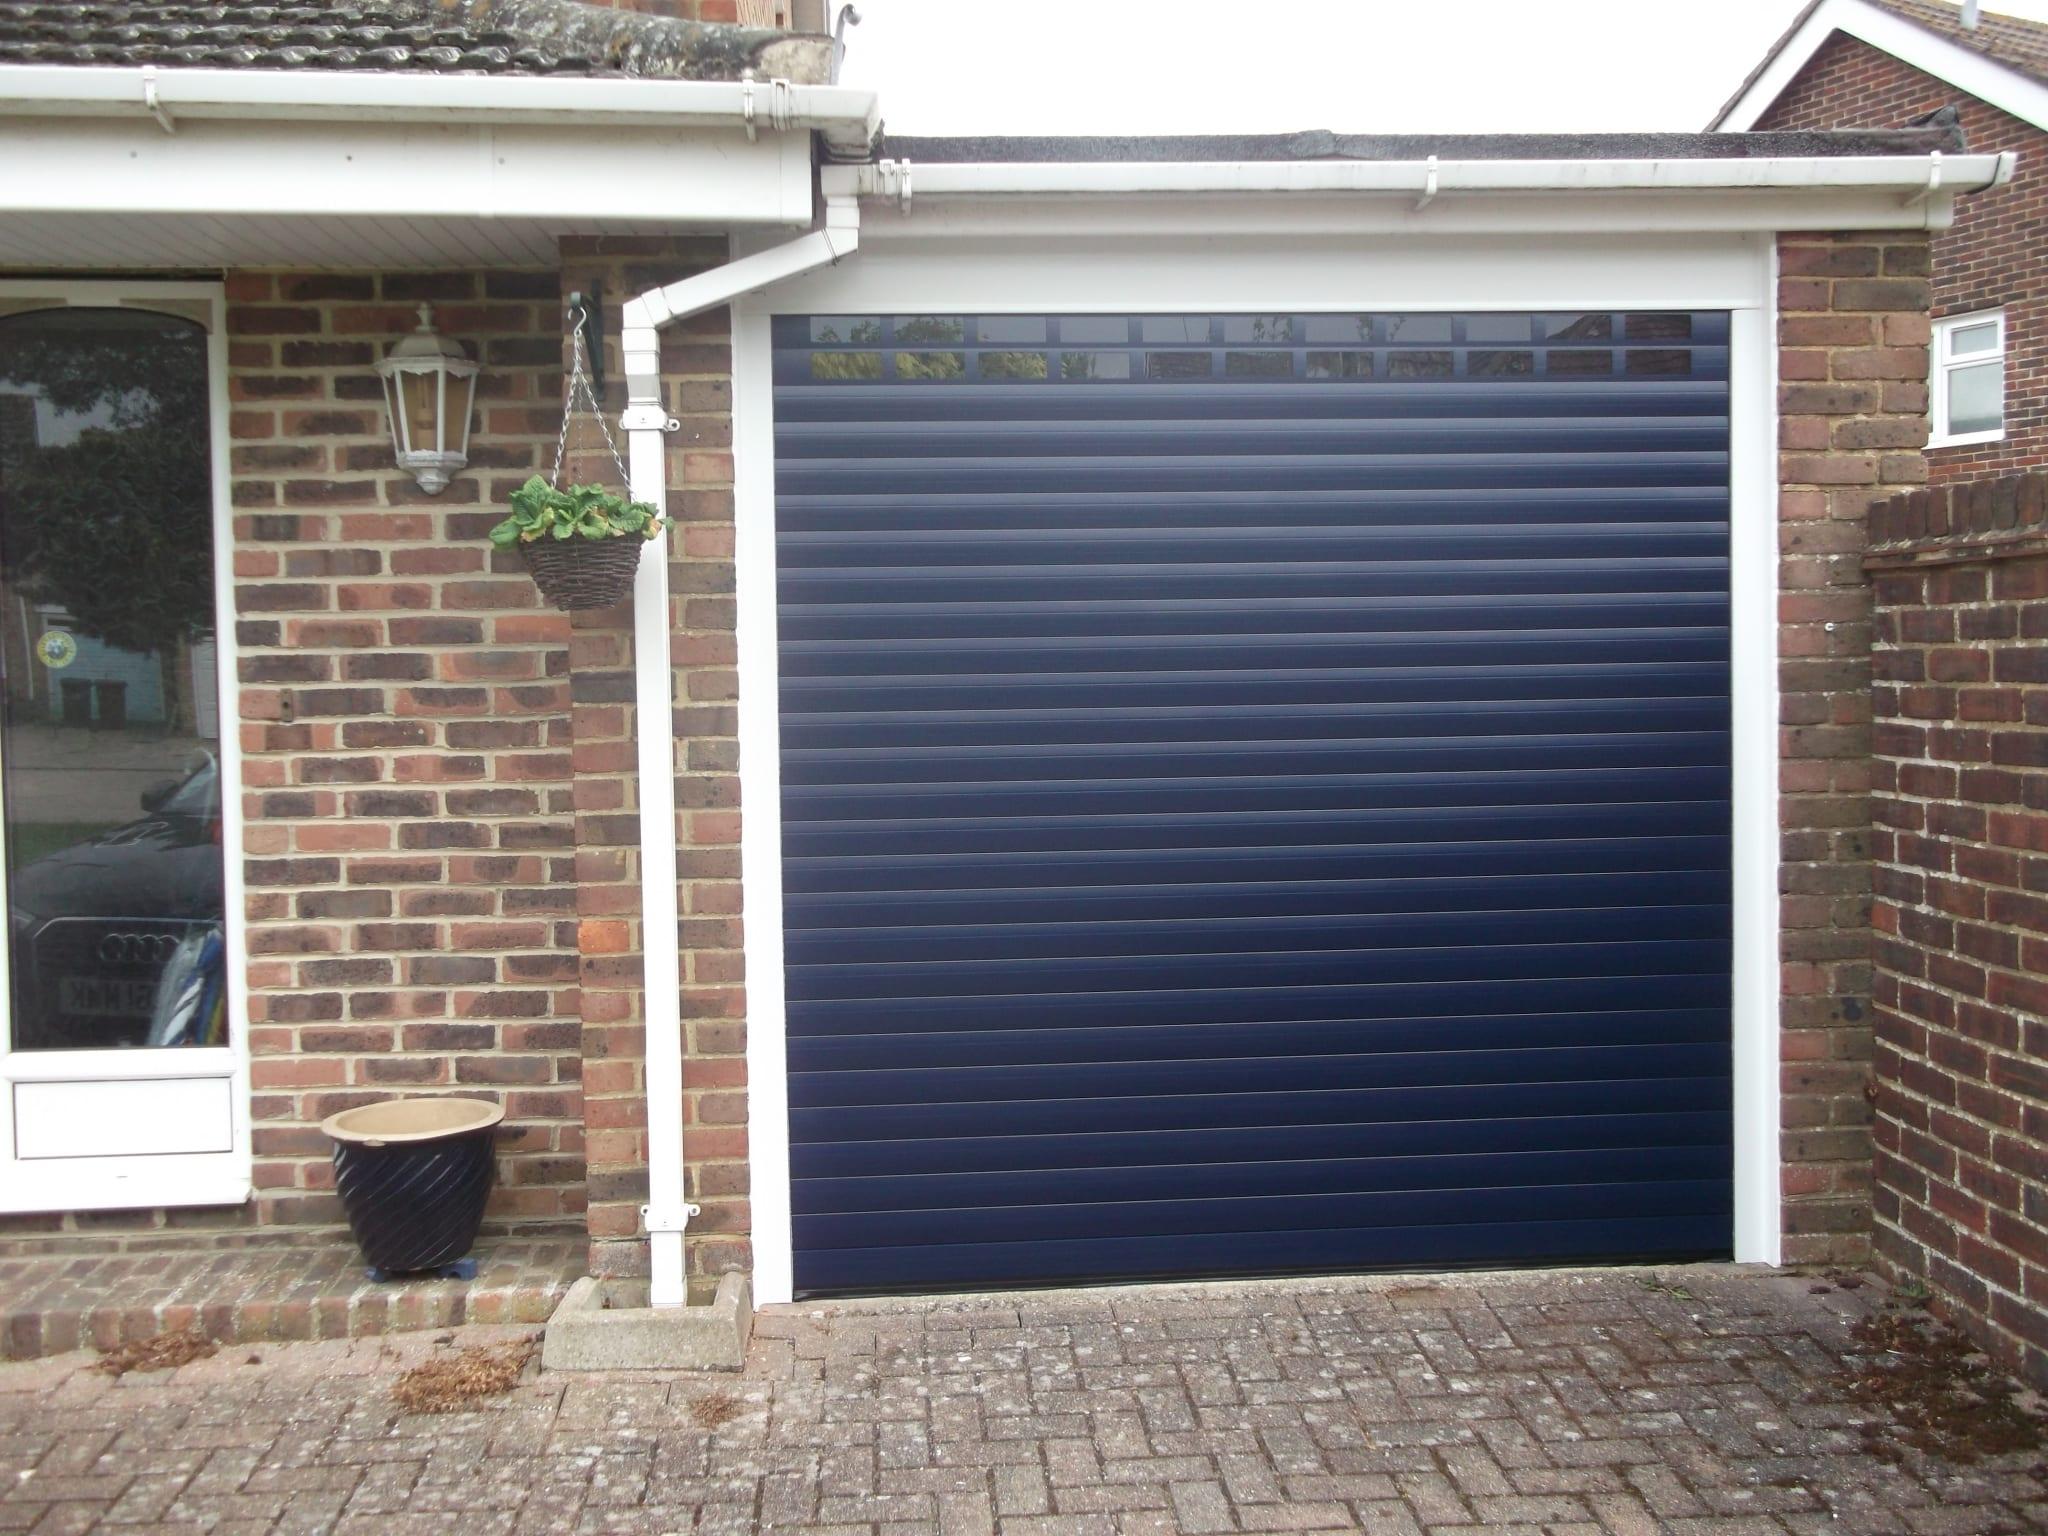 Seceuroglide insulated sectional garage door georgian cassette - Seceuroglide Excel Roller Door